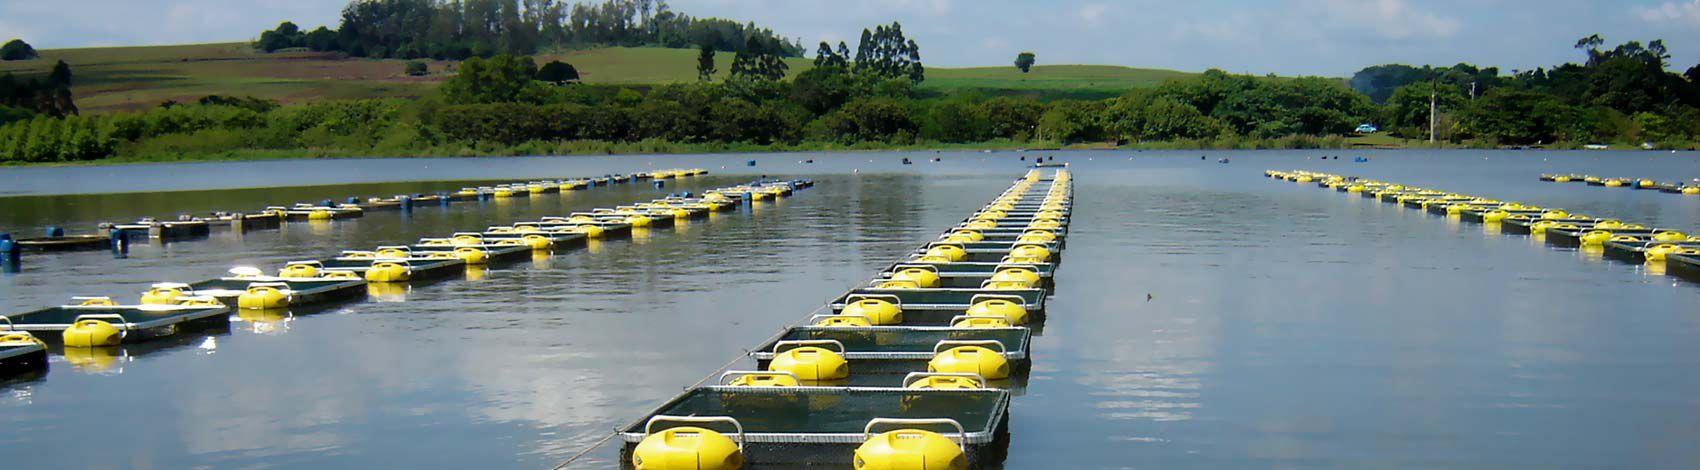 piscicultura-de-tilapias